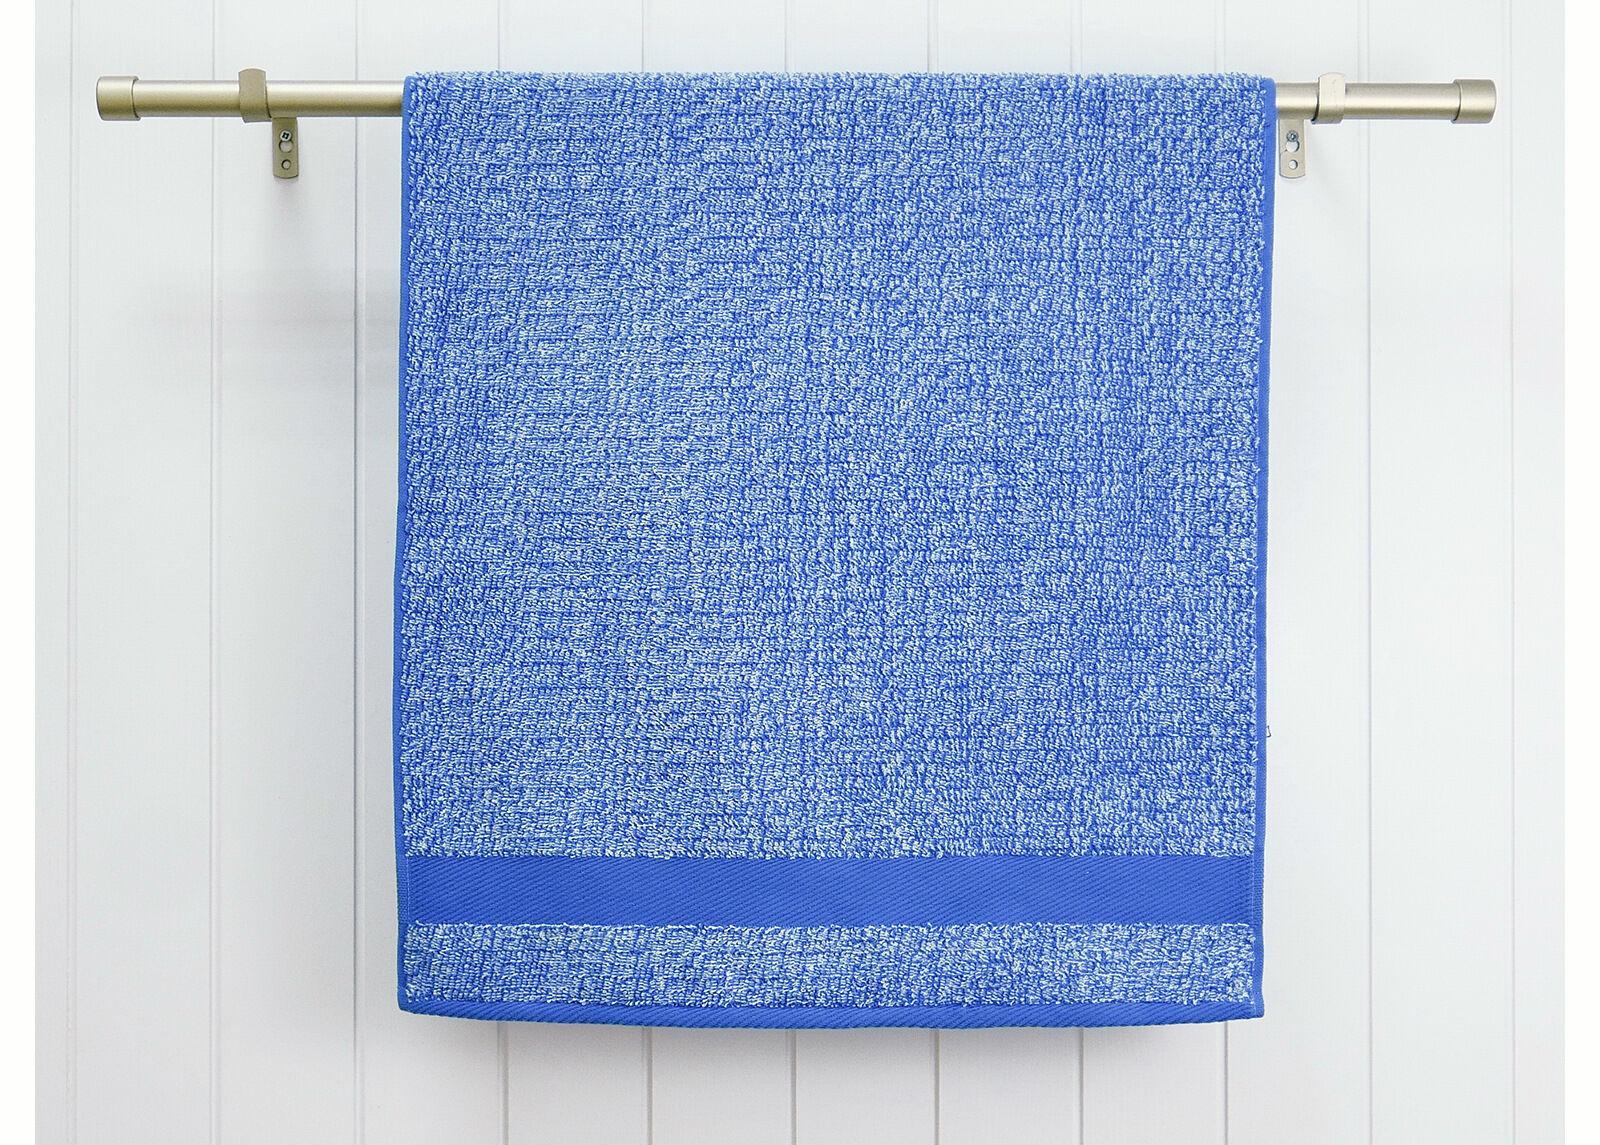 ARDENZA Froteepyyhe Melange 70x140 cm, sinine